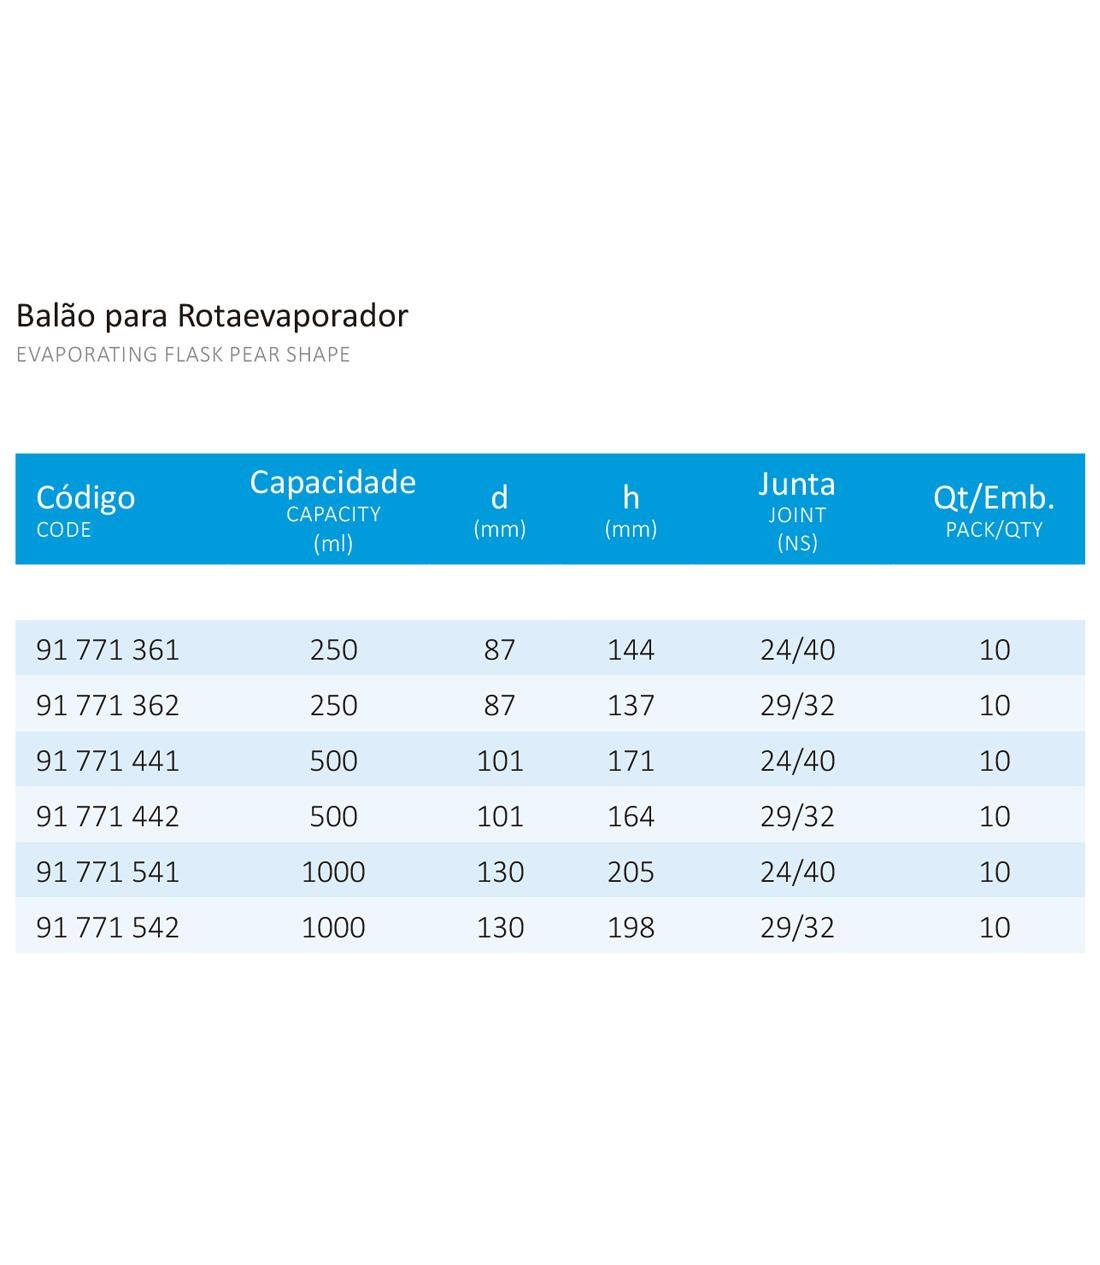 BALAO PARA ROTAEVAPORACAO COM JUNTA 24/40 1000 ML - Laborglas - Cód. 91771541